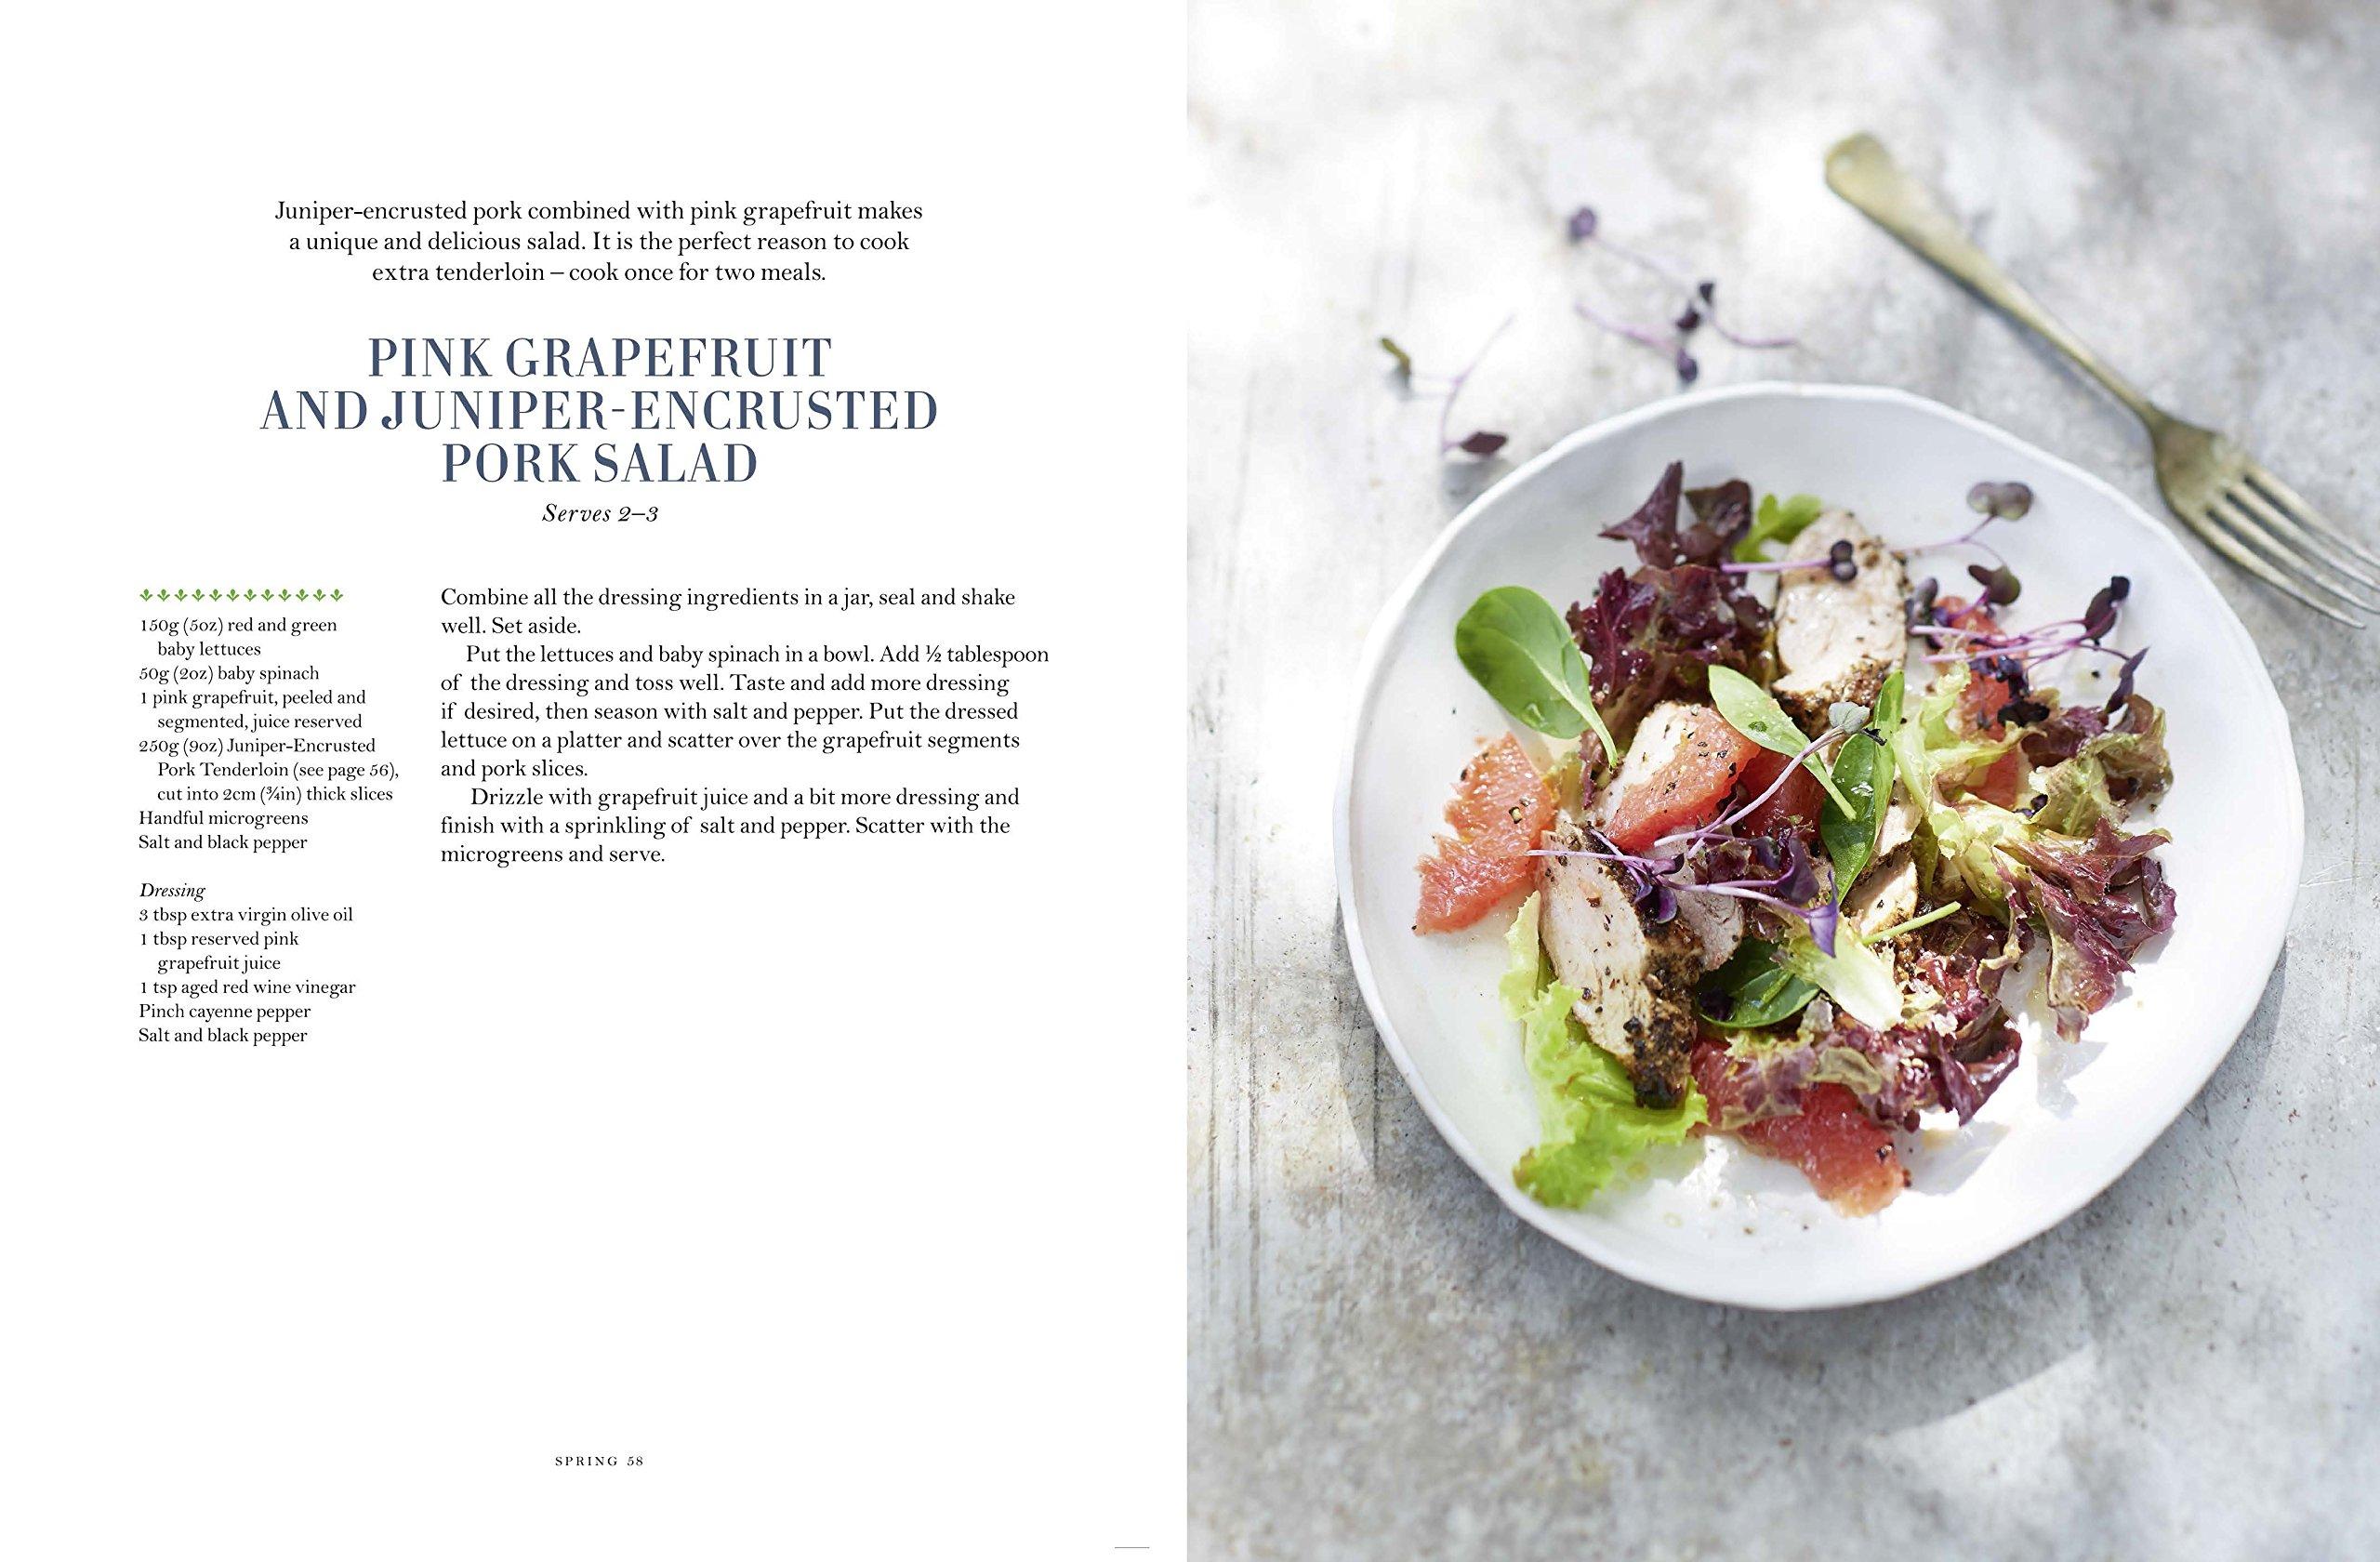 Eivissa: The Ibiza Cookbook: Amazon.co.uk: Anne Sijmonsbergen: 9780008167158: Books